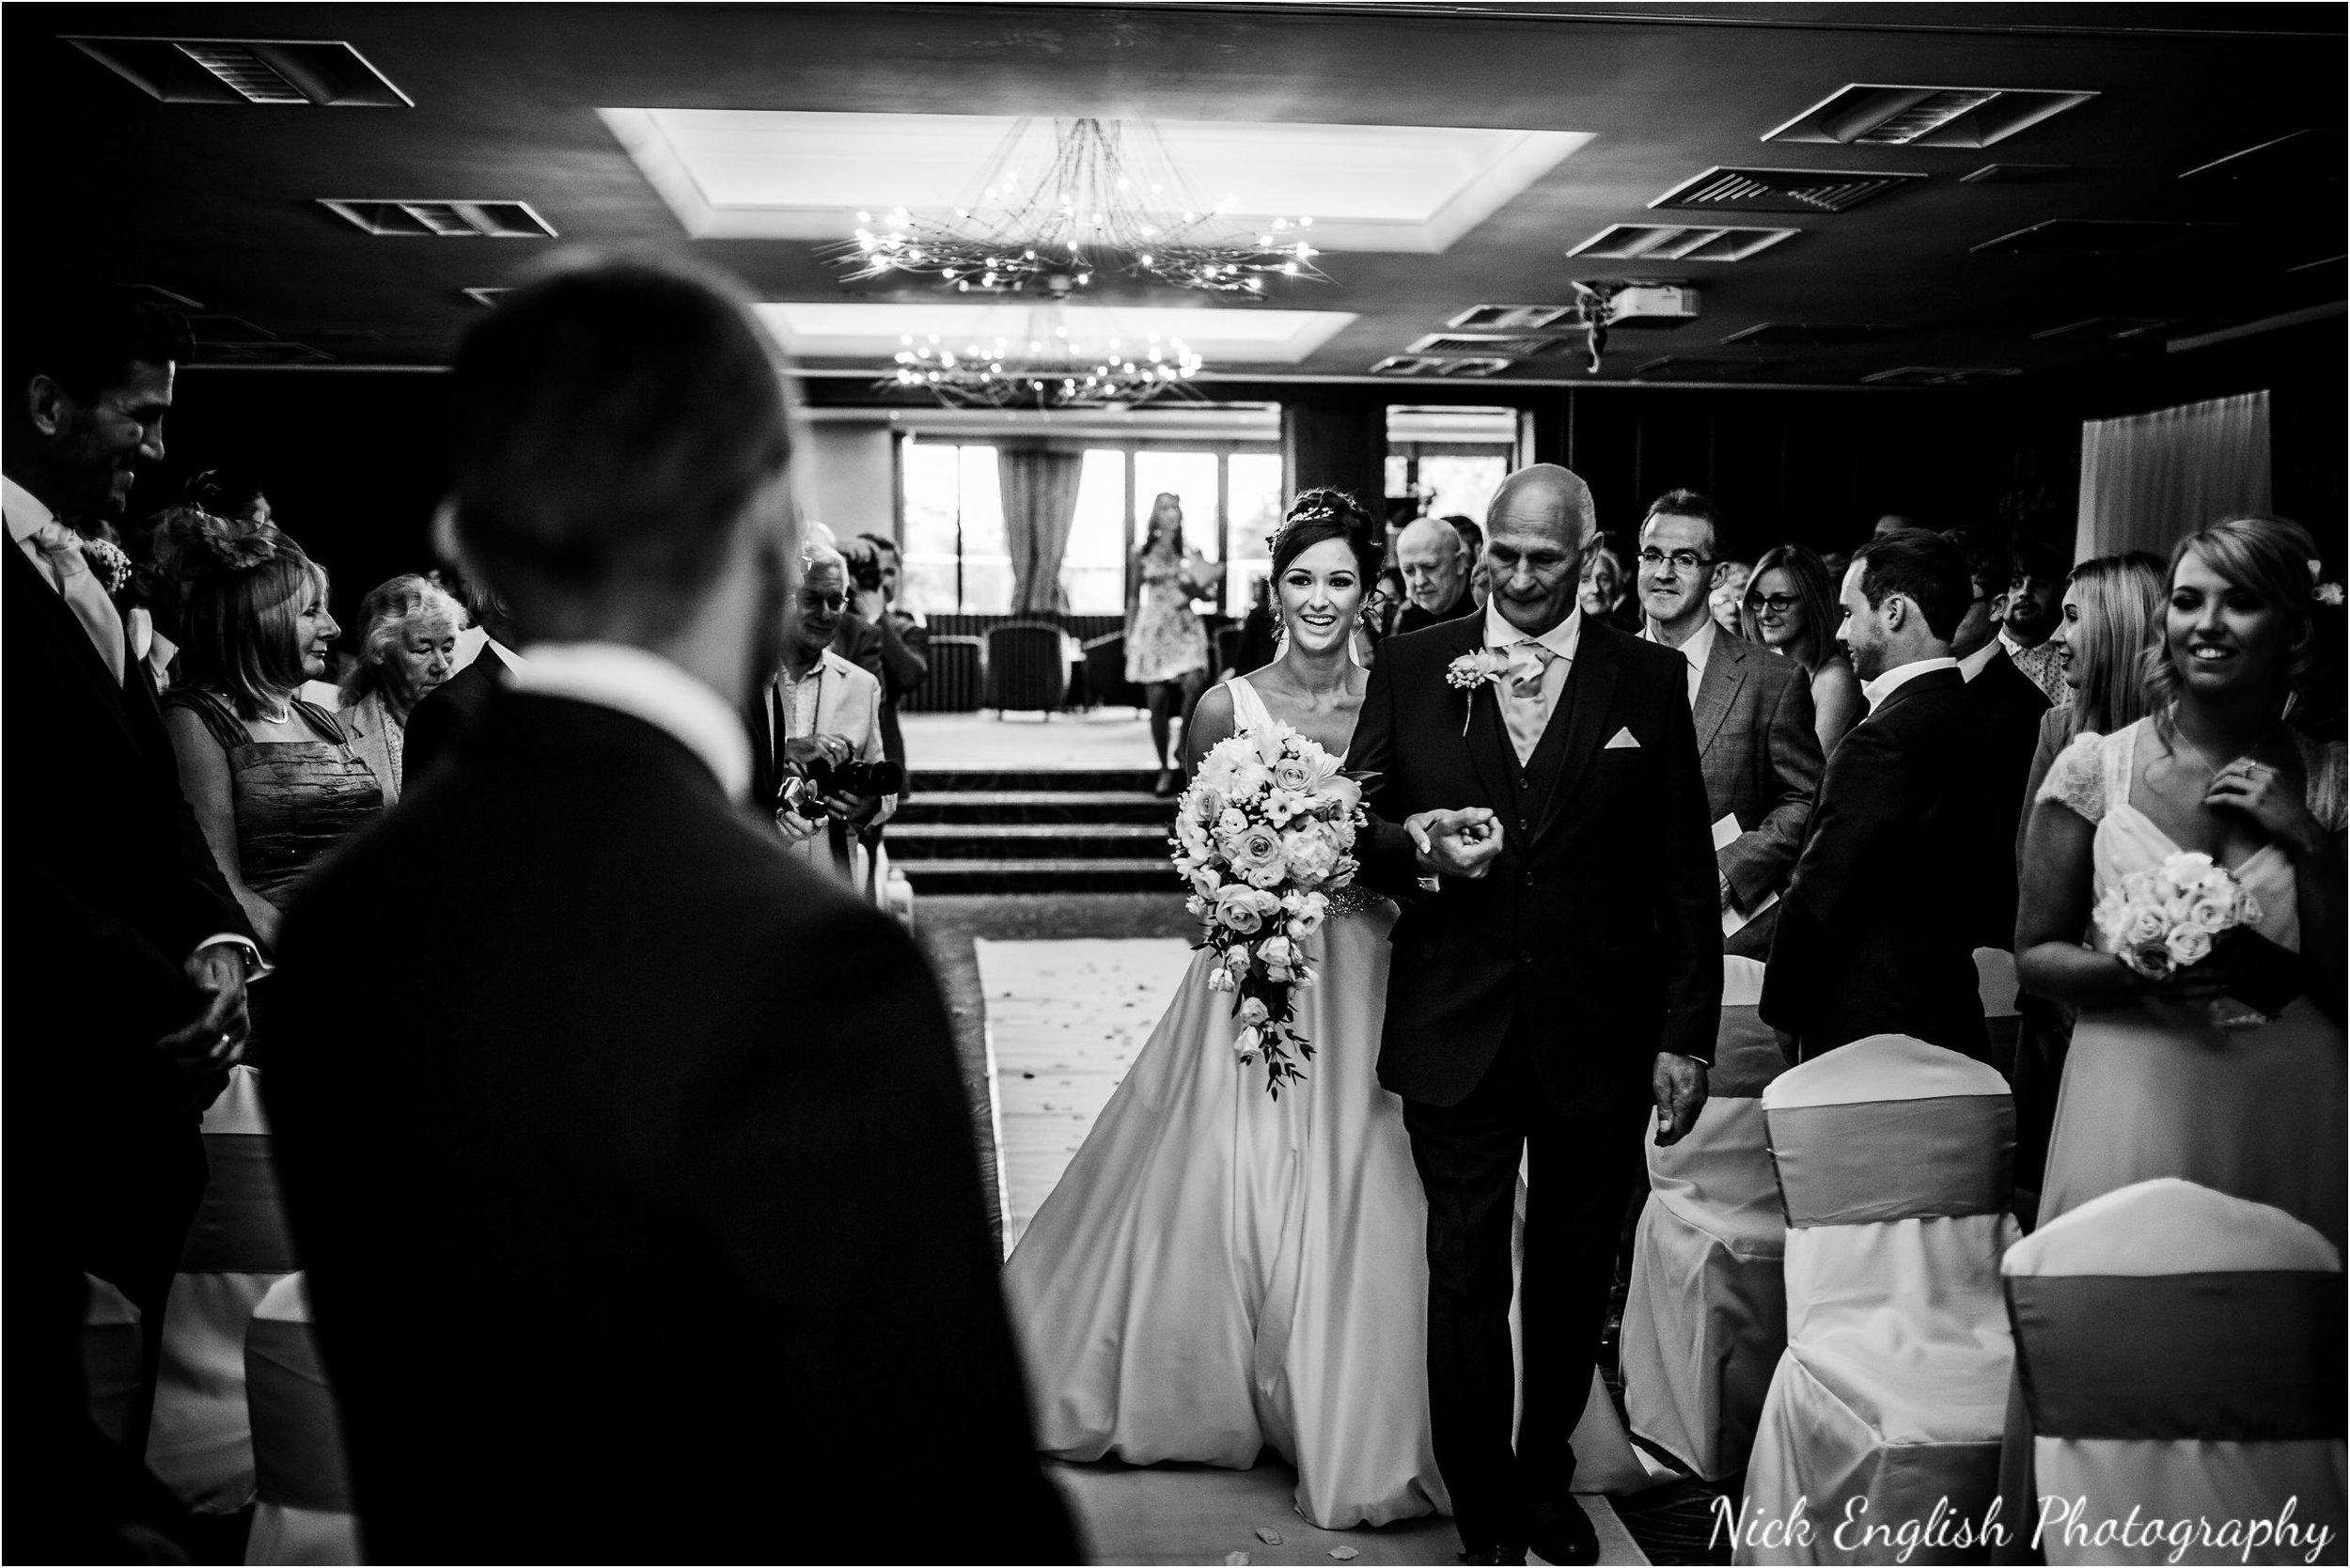 Emily David Wedding Photographs at Barton Grange Preston by Nick English Photography 57jpg.jpeg